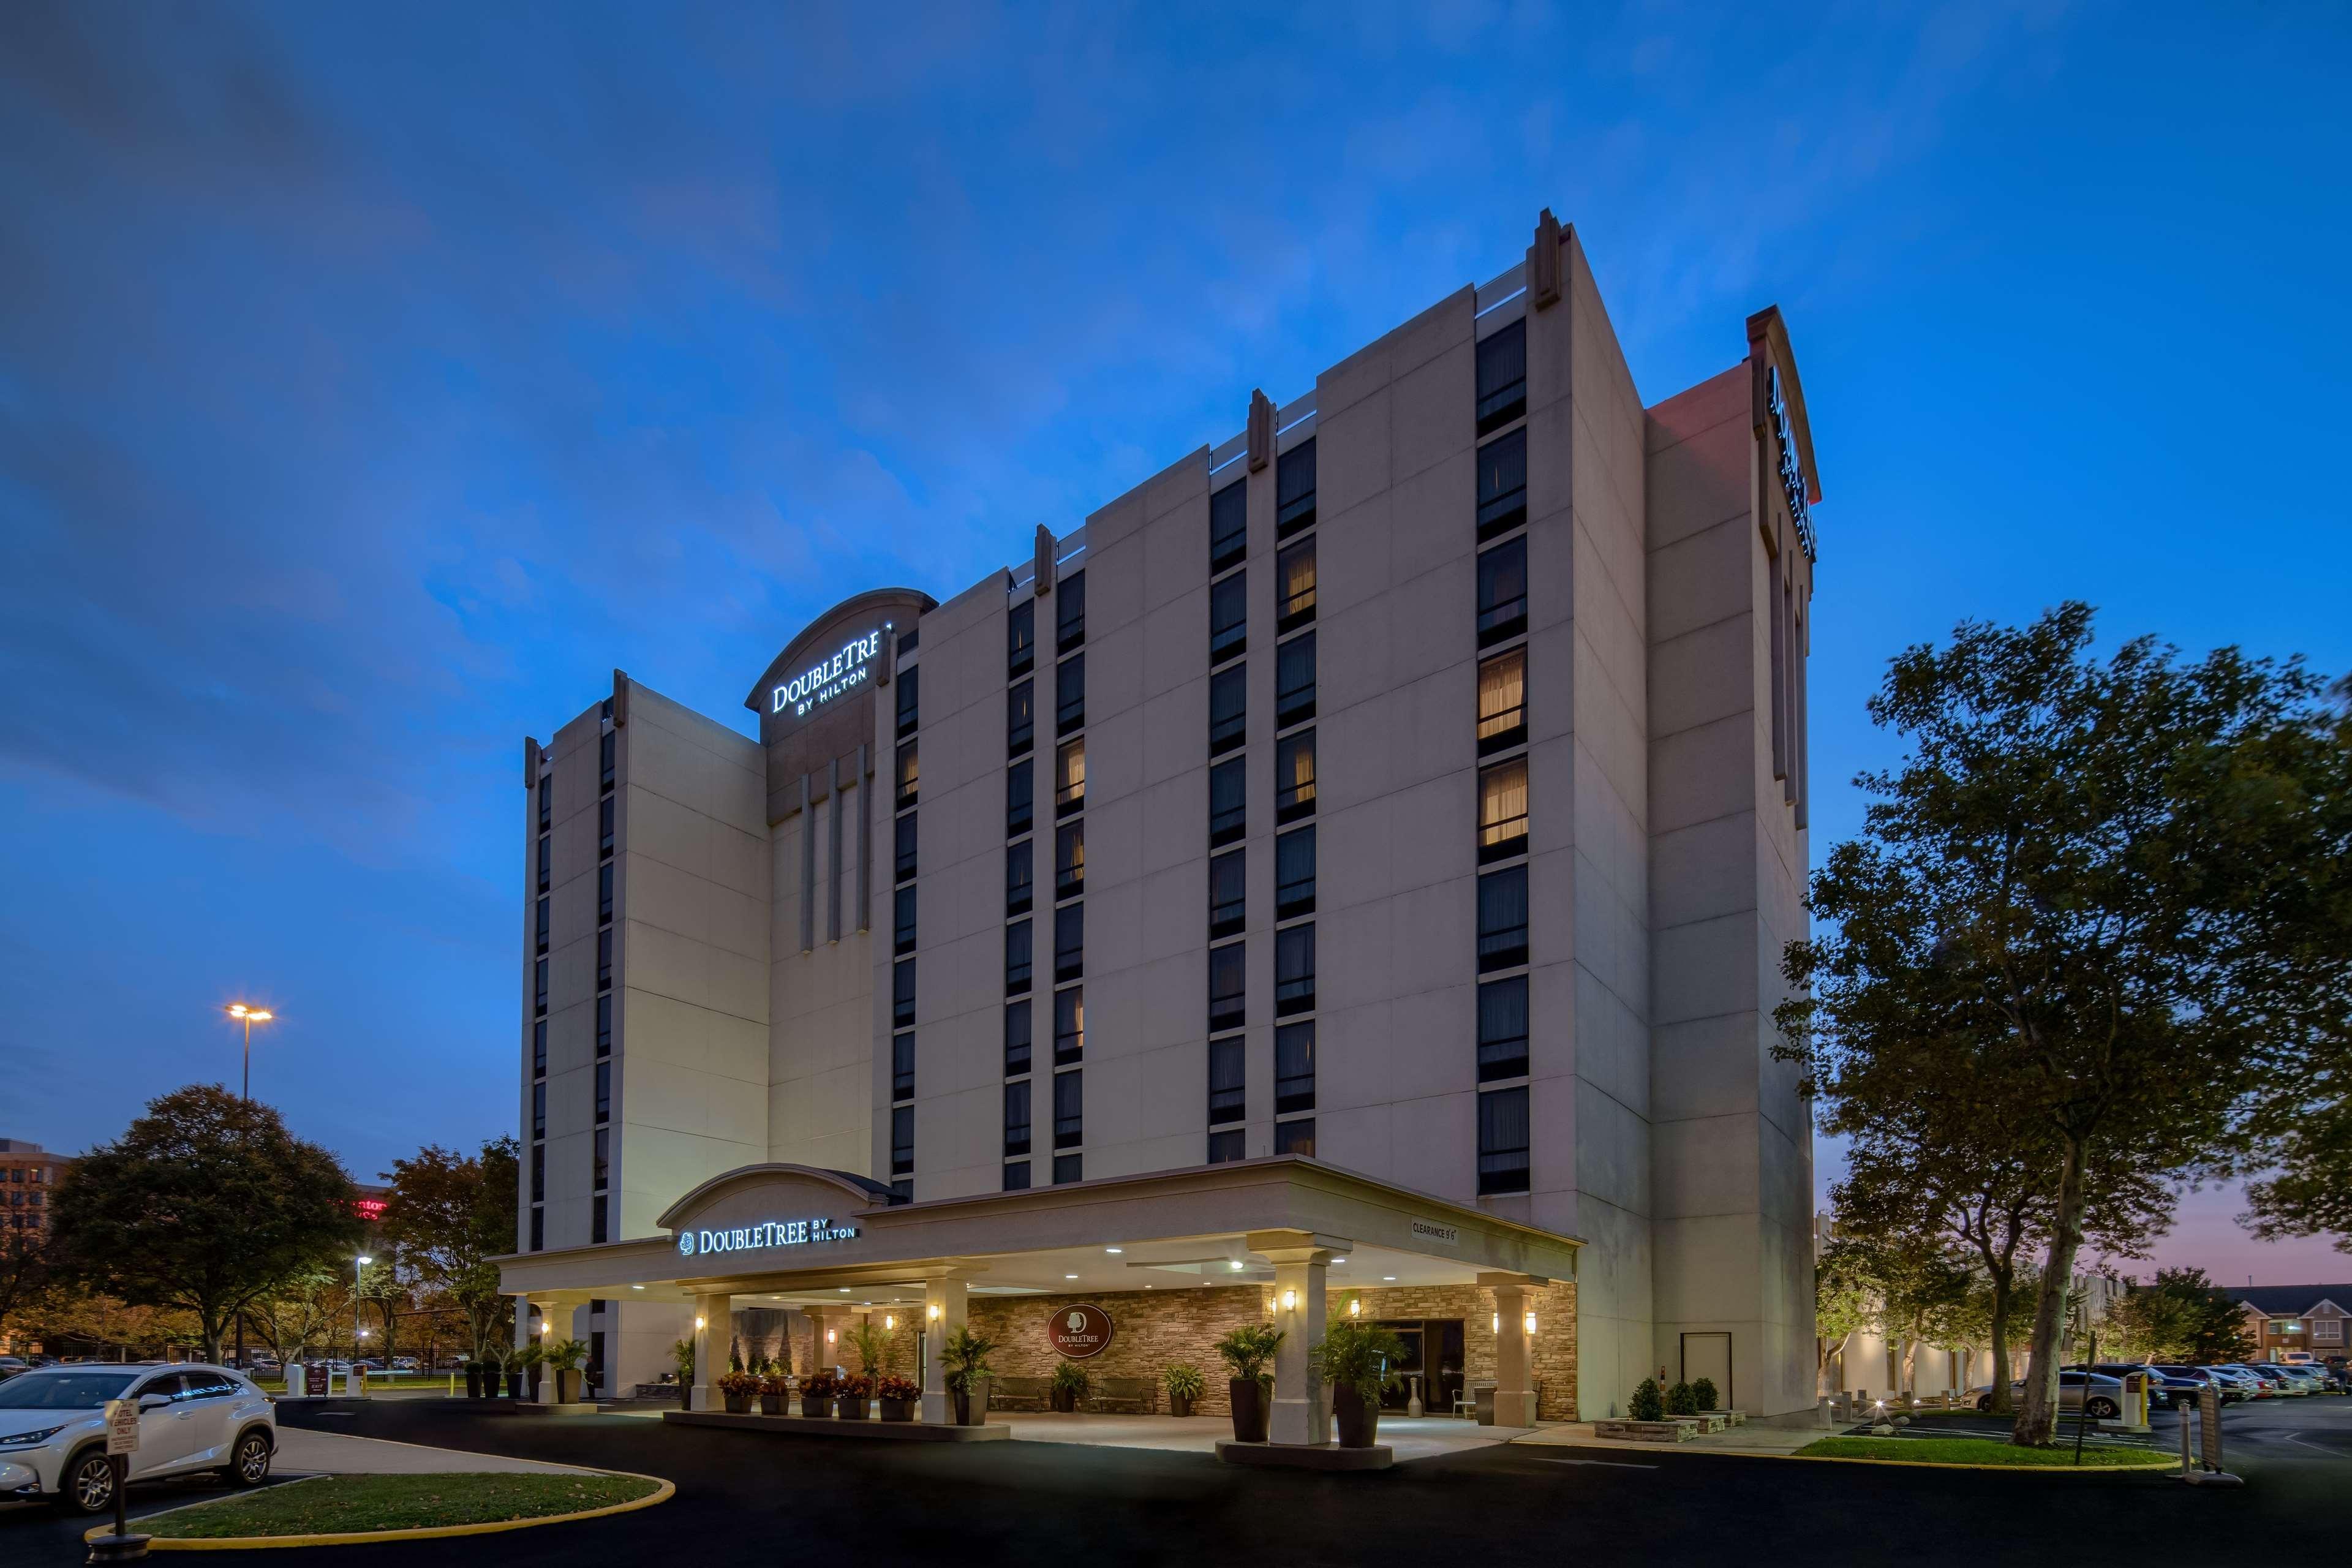 DoubleTree by Hilton Hotel Philadelphia Airport